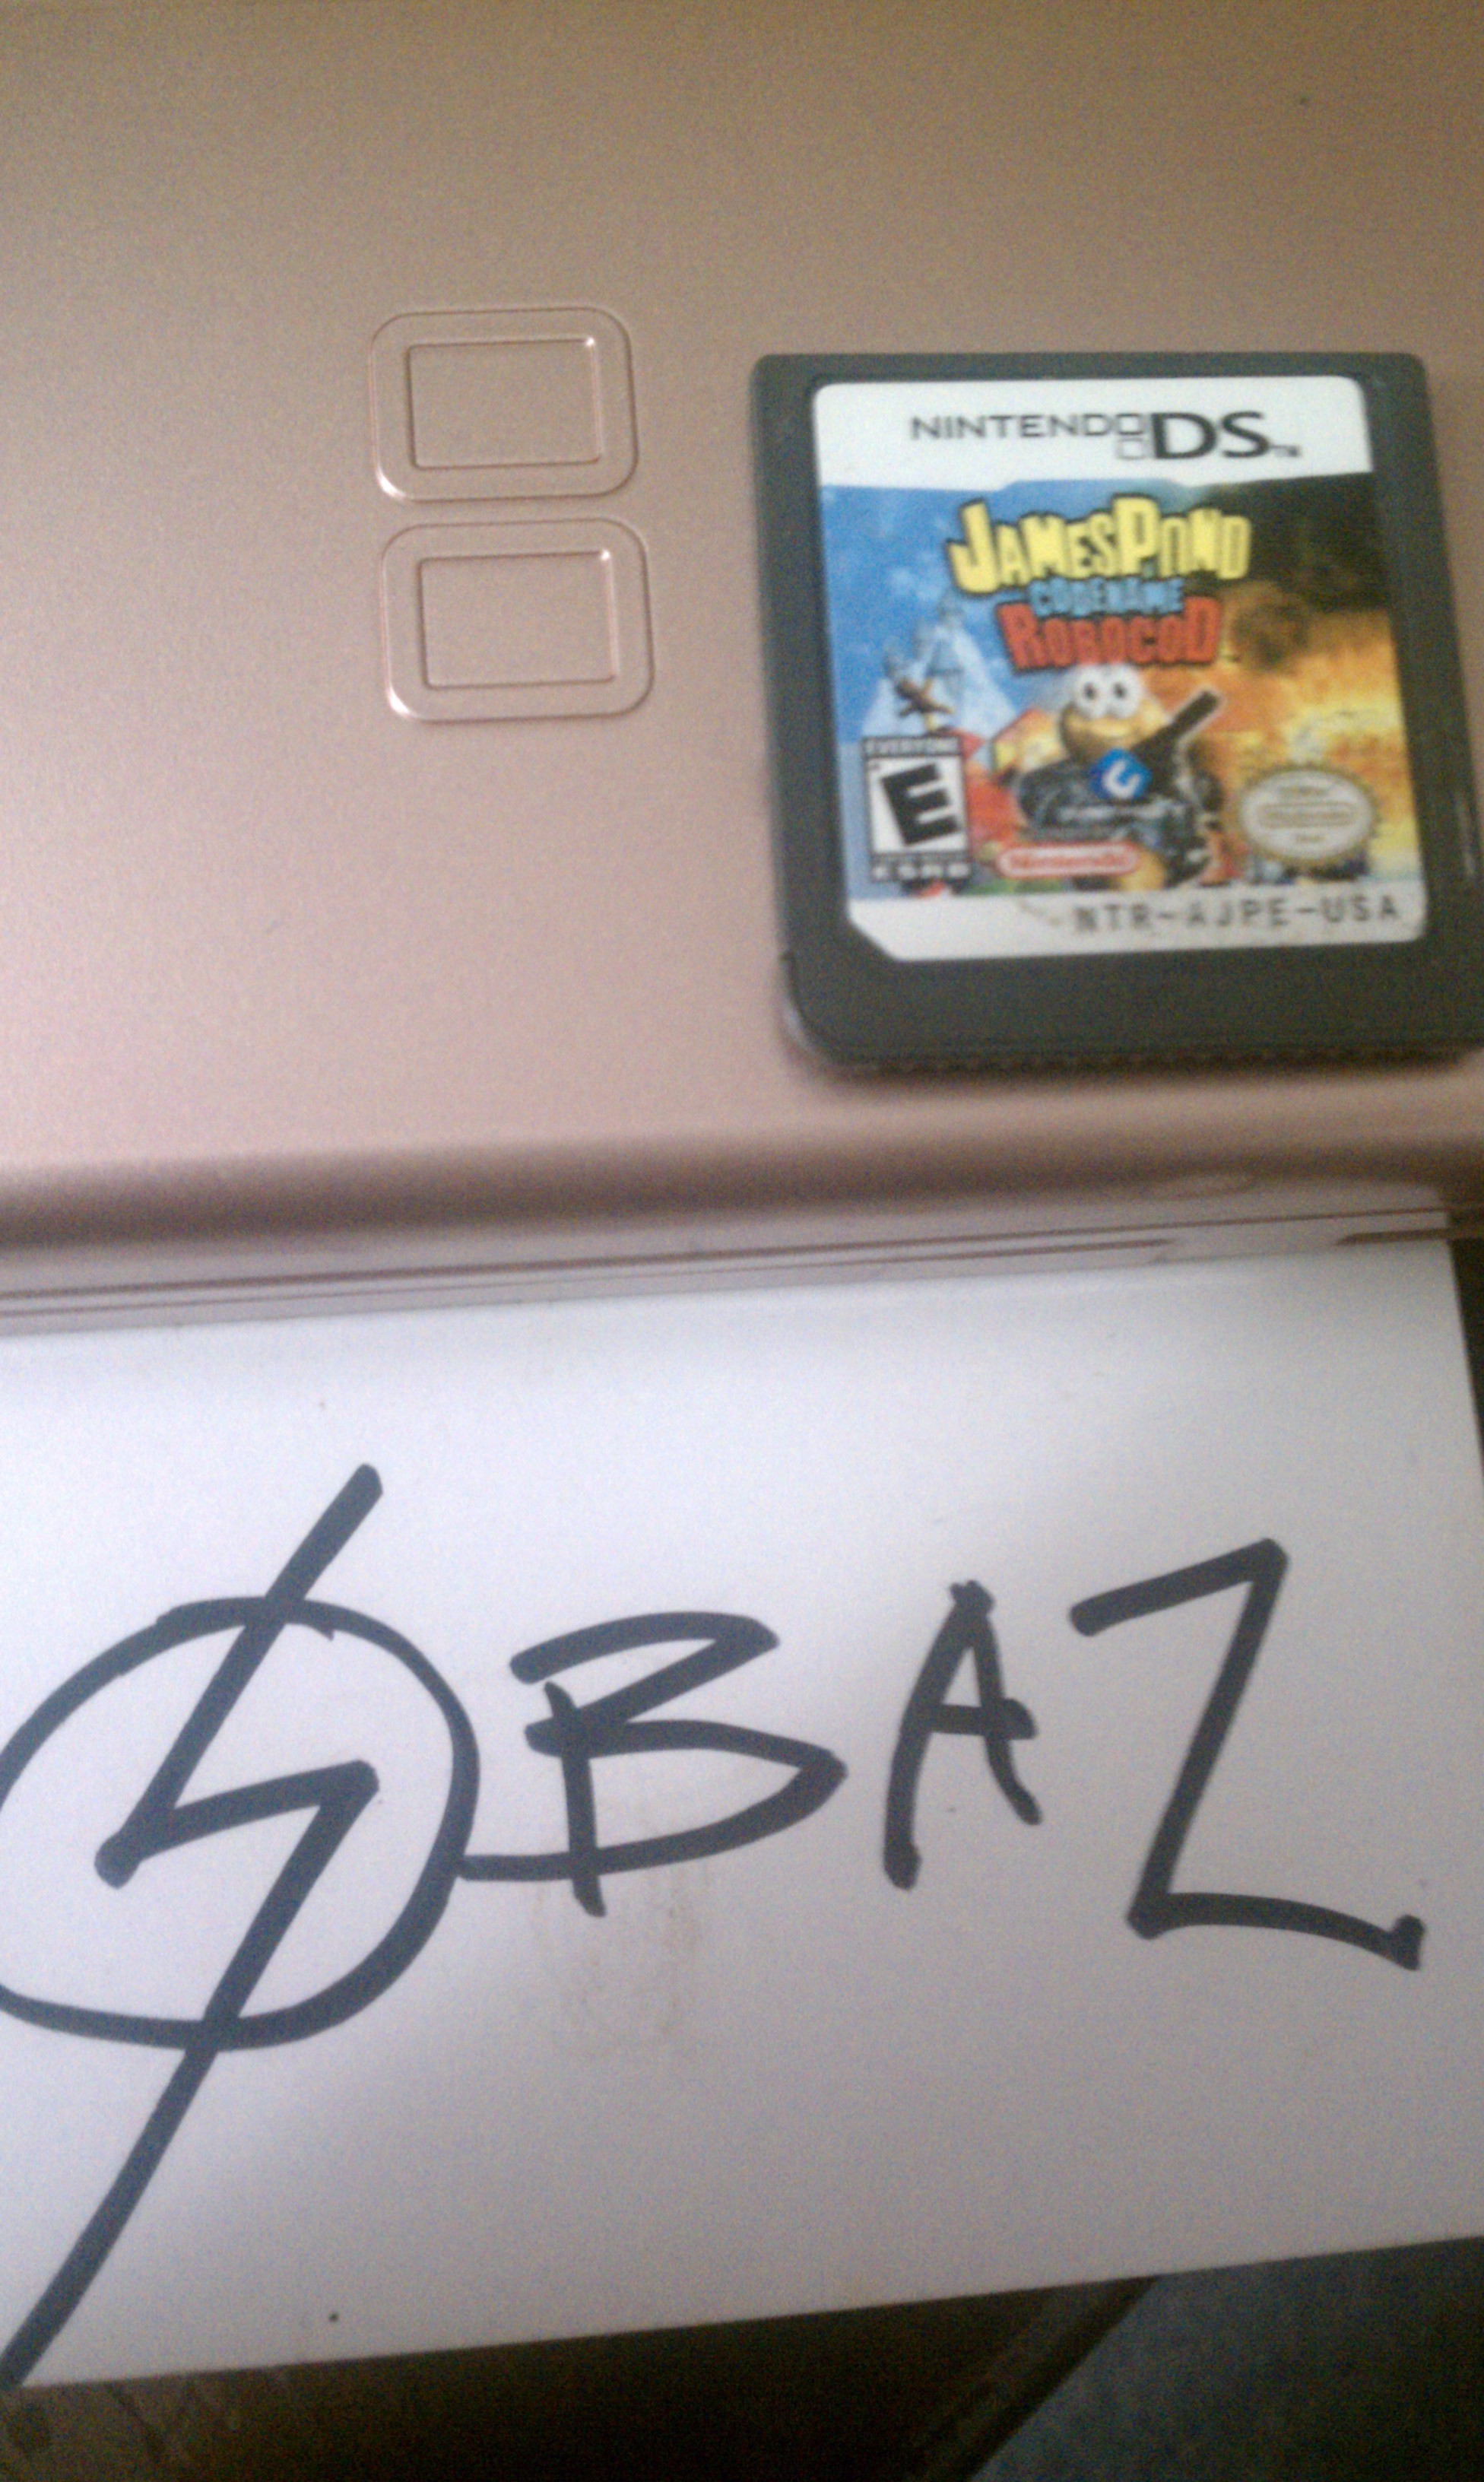 S.BAZ: James Pond: Codename RoboCod (Nintendo DS) 254,300 points on 2020-03-28 08:23:33